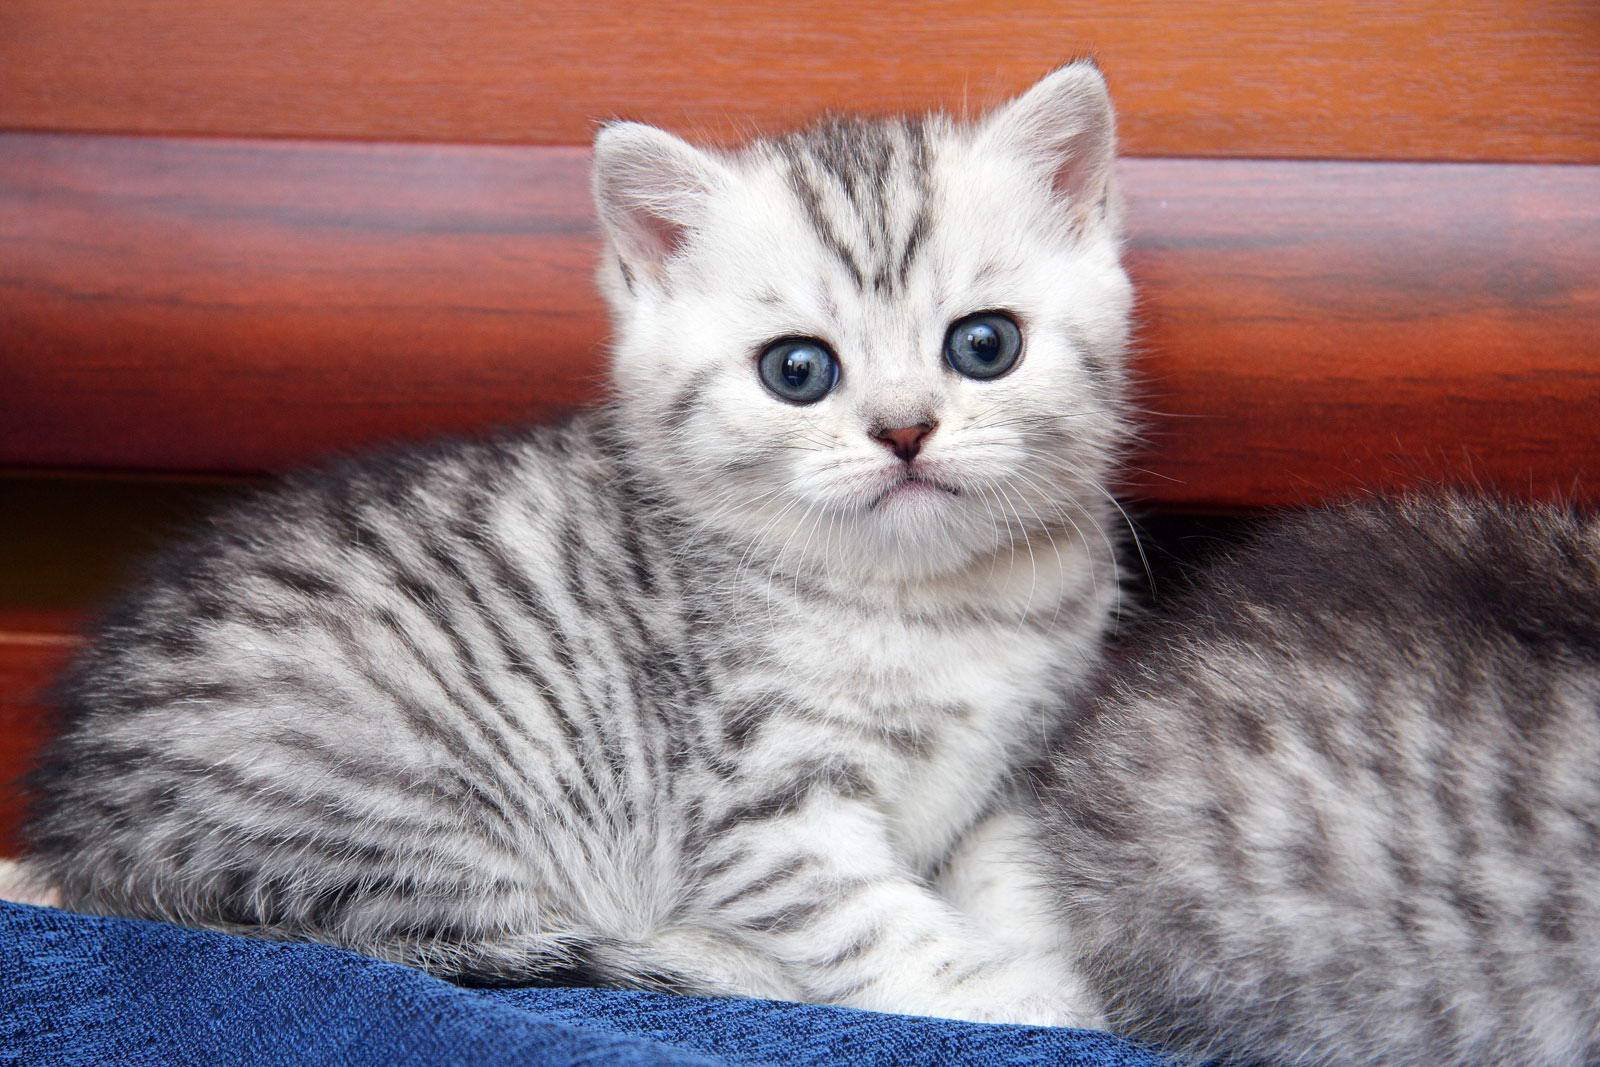 Порода котёнка из рекламы «вискас»: фото и видео   сайт «мурло»